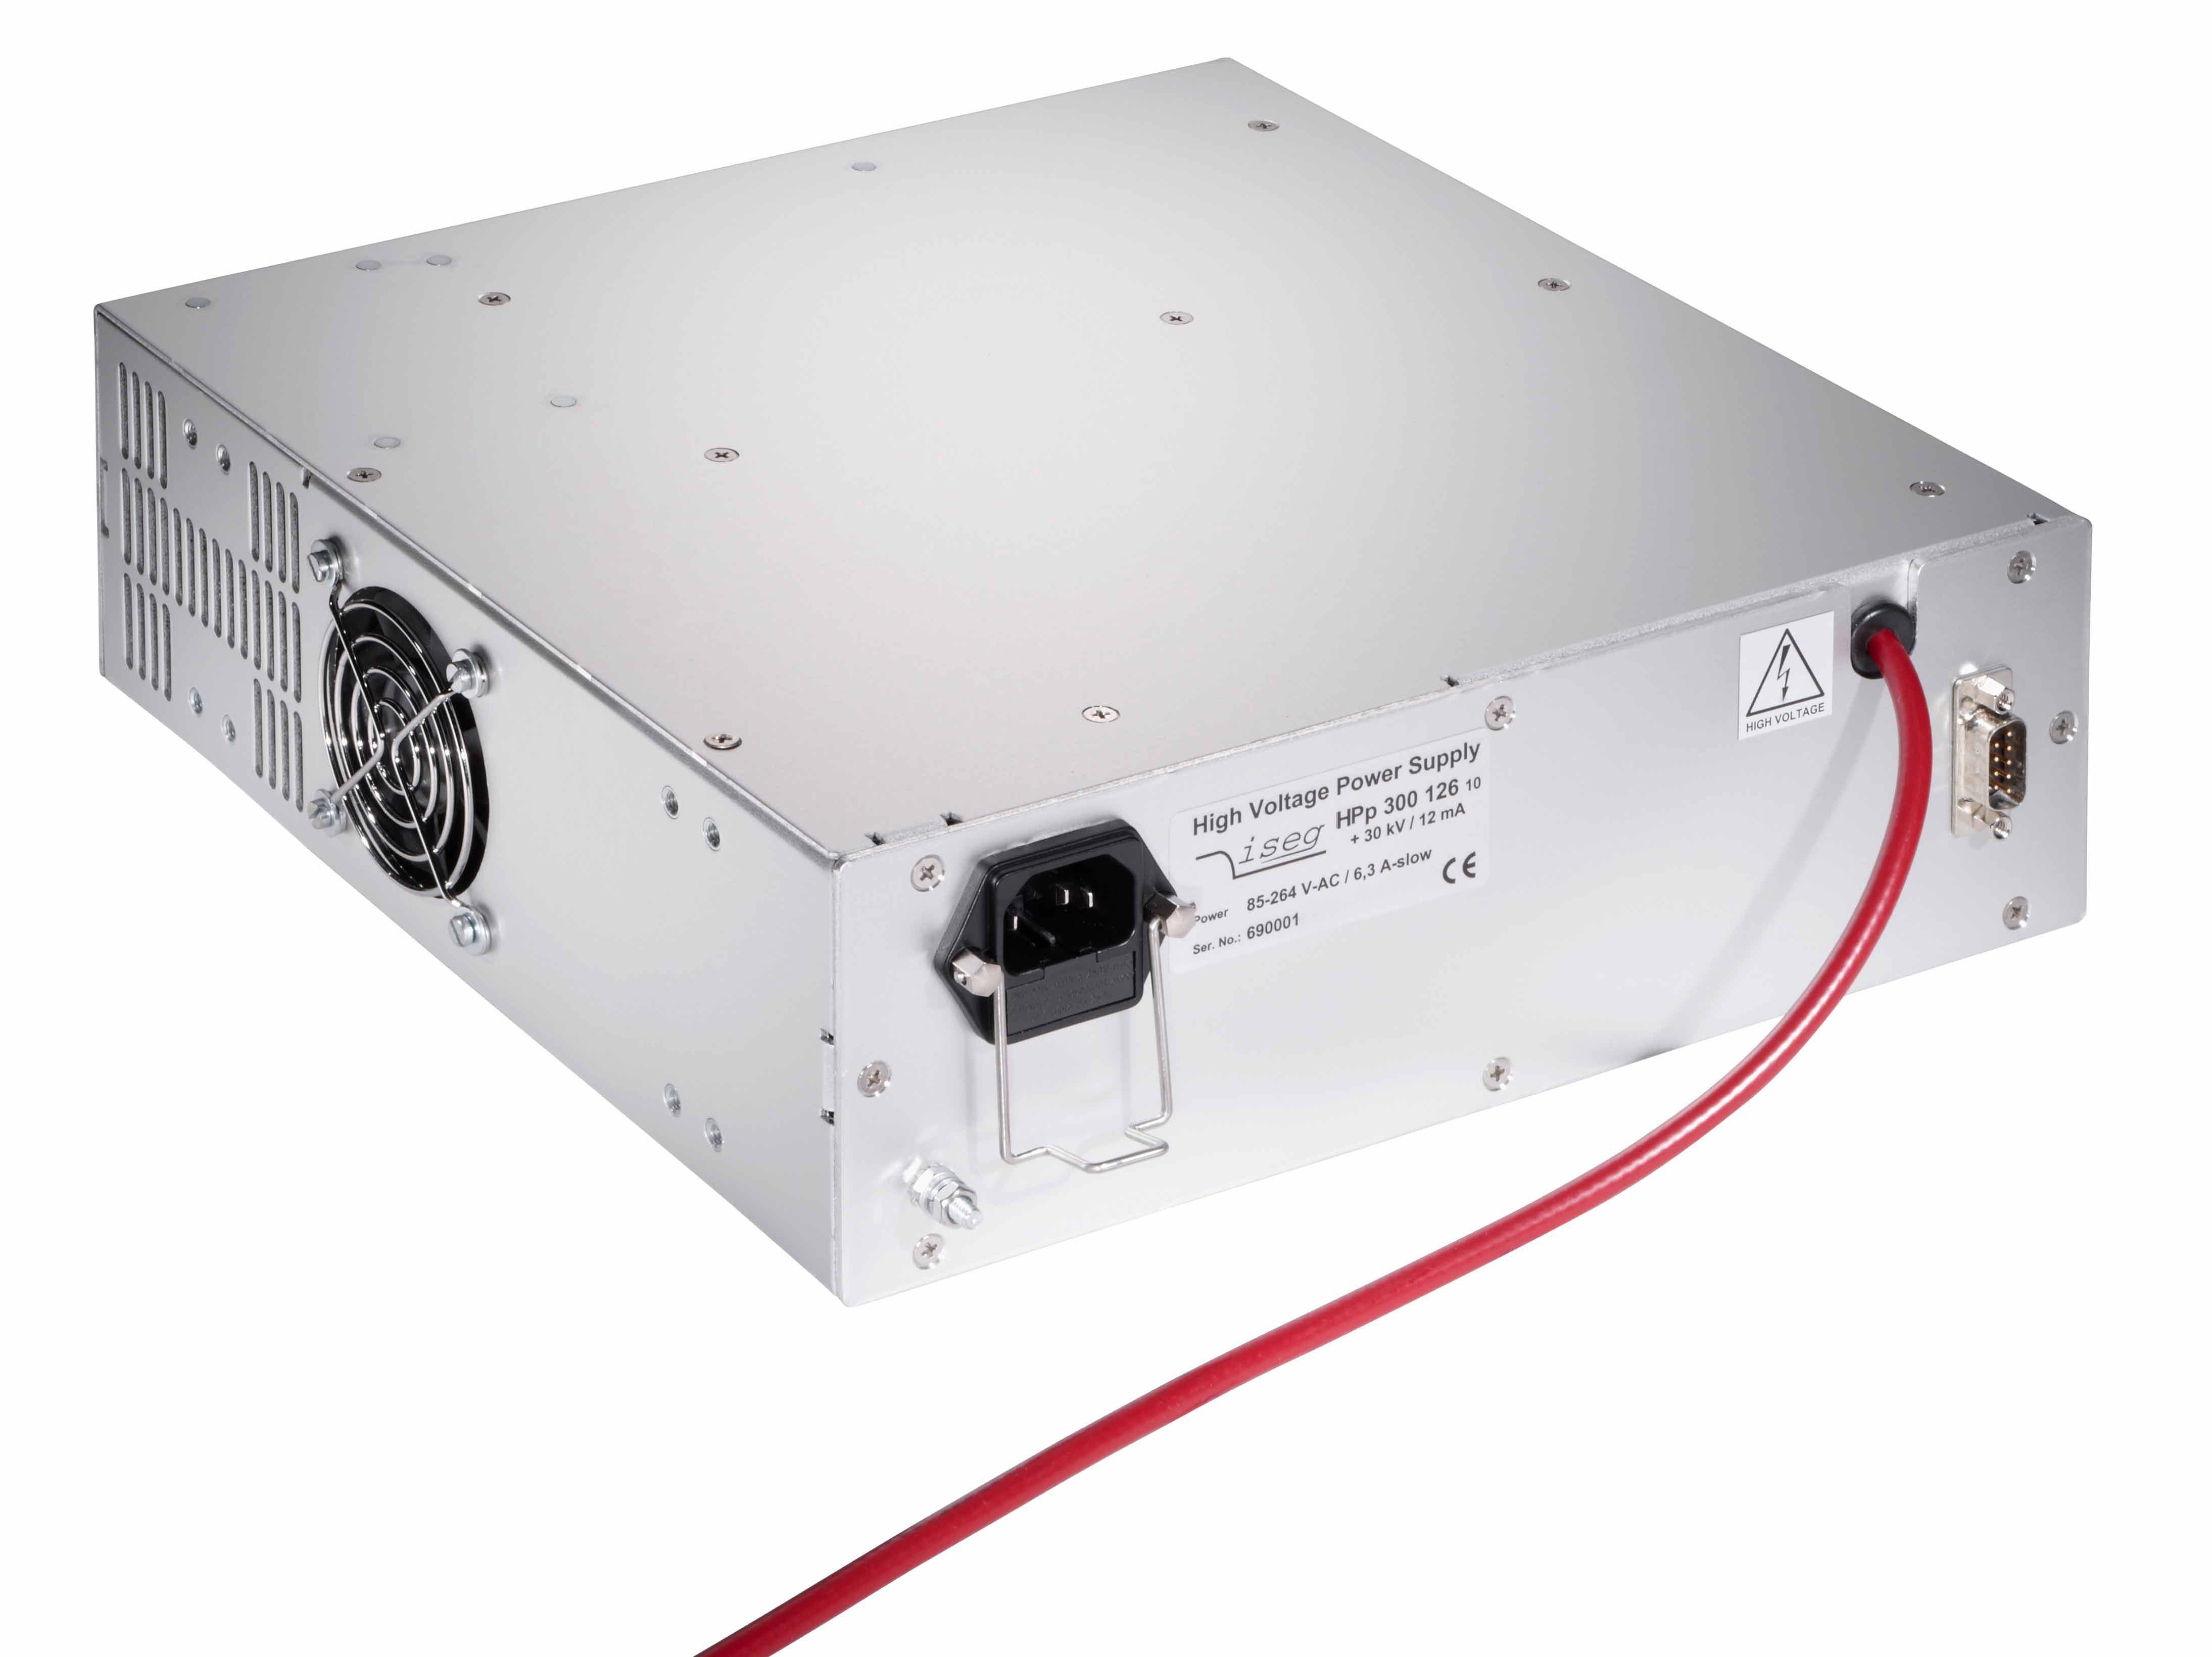 Generateur haute tension compact non instrumente 30 kV